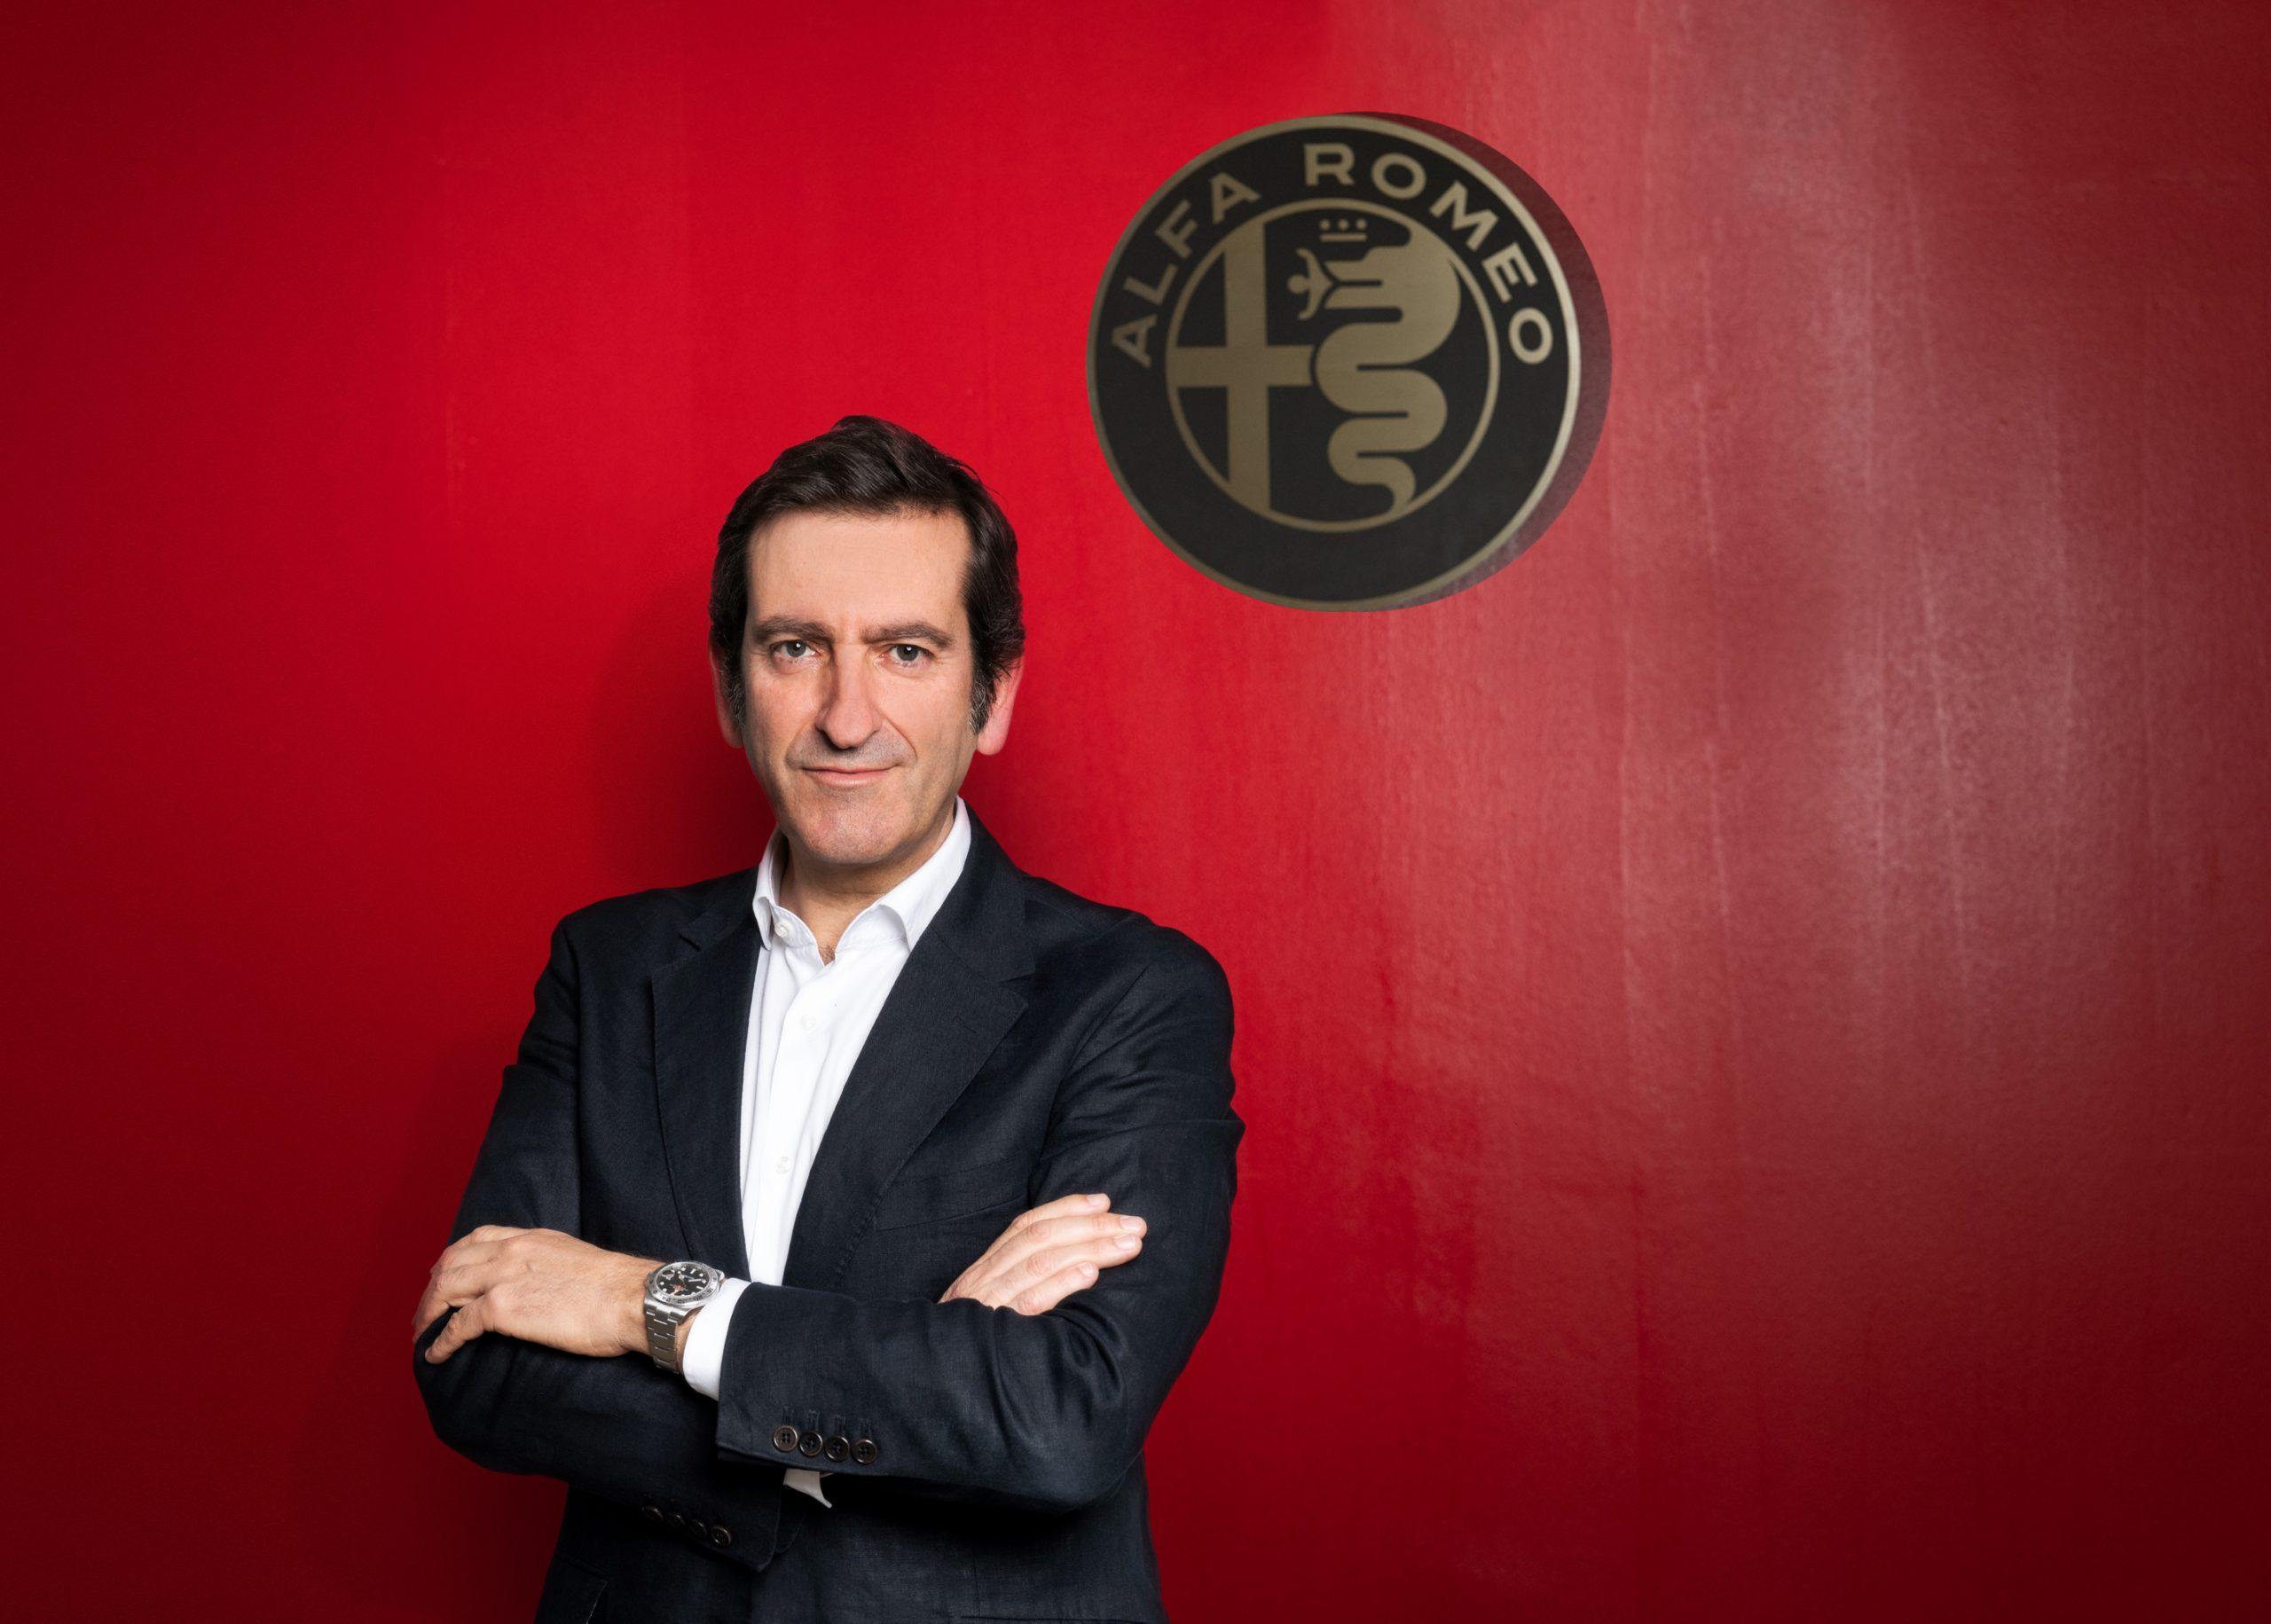 Alejandro Mesonero Romanos scaled Alfa Romeo : O Alejandro Mesonero-Romanos στη θέση του Επικεφαλής Σχεδίασης alfa romeo, ειδήσεις, Νέα